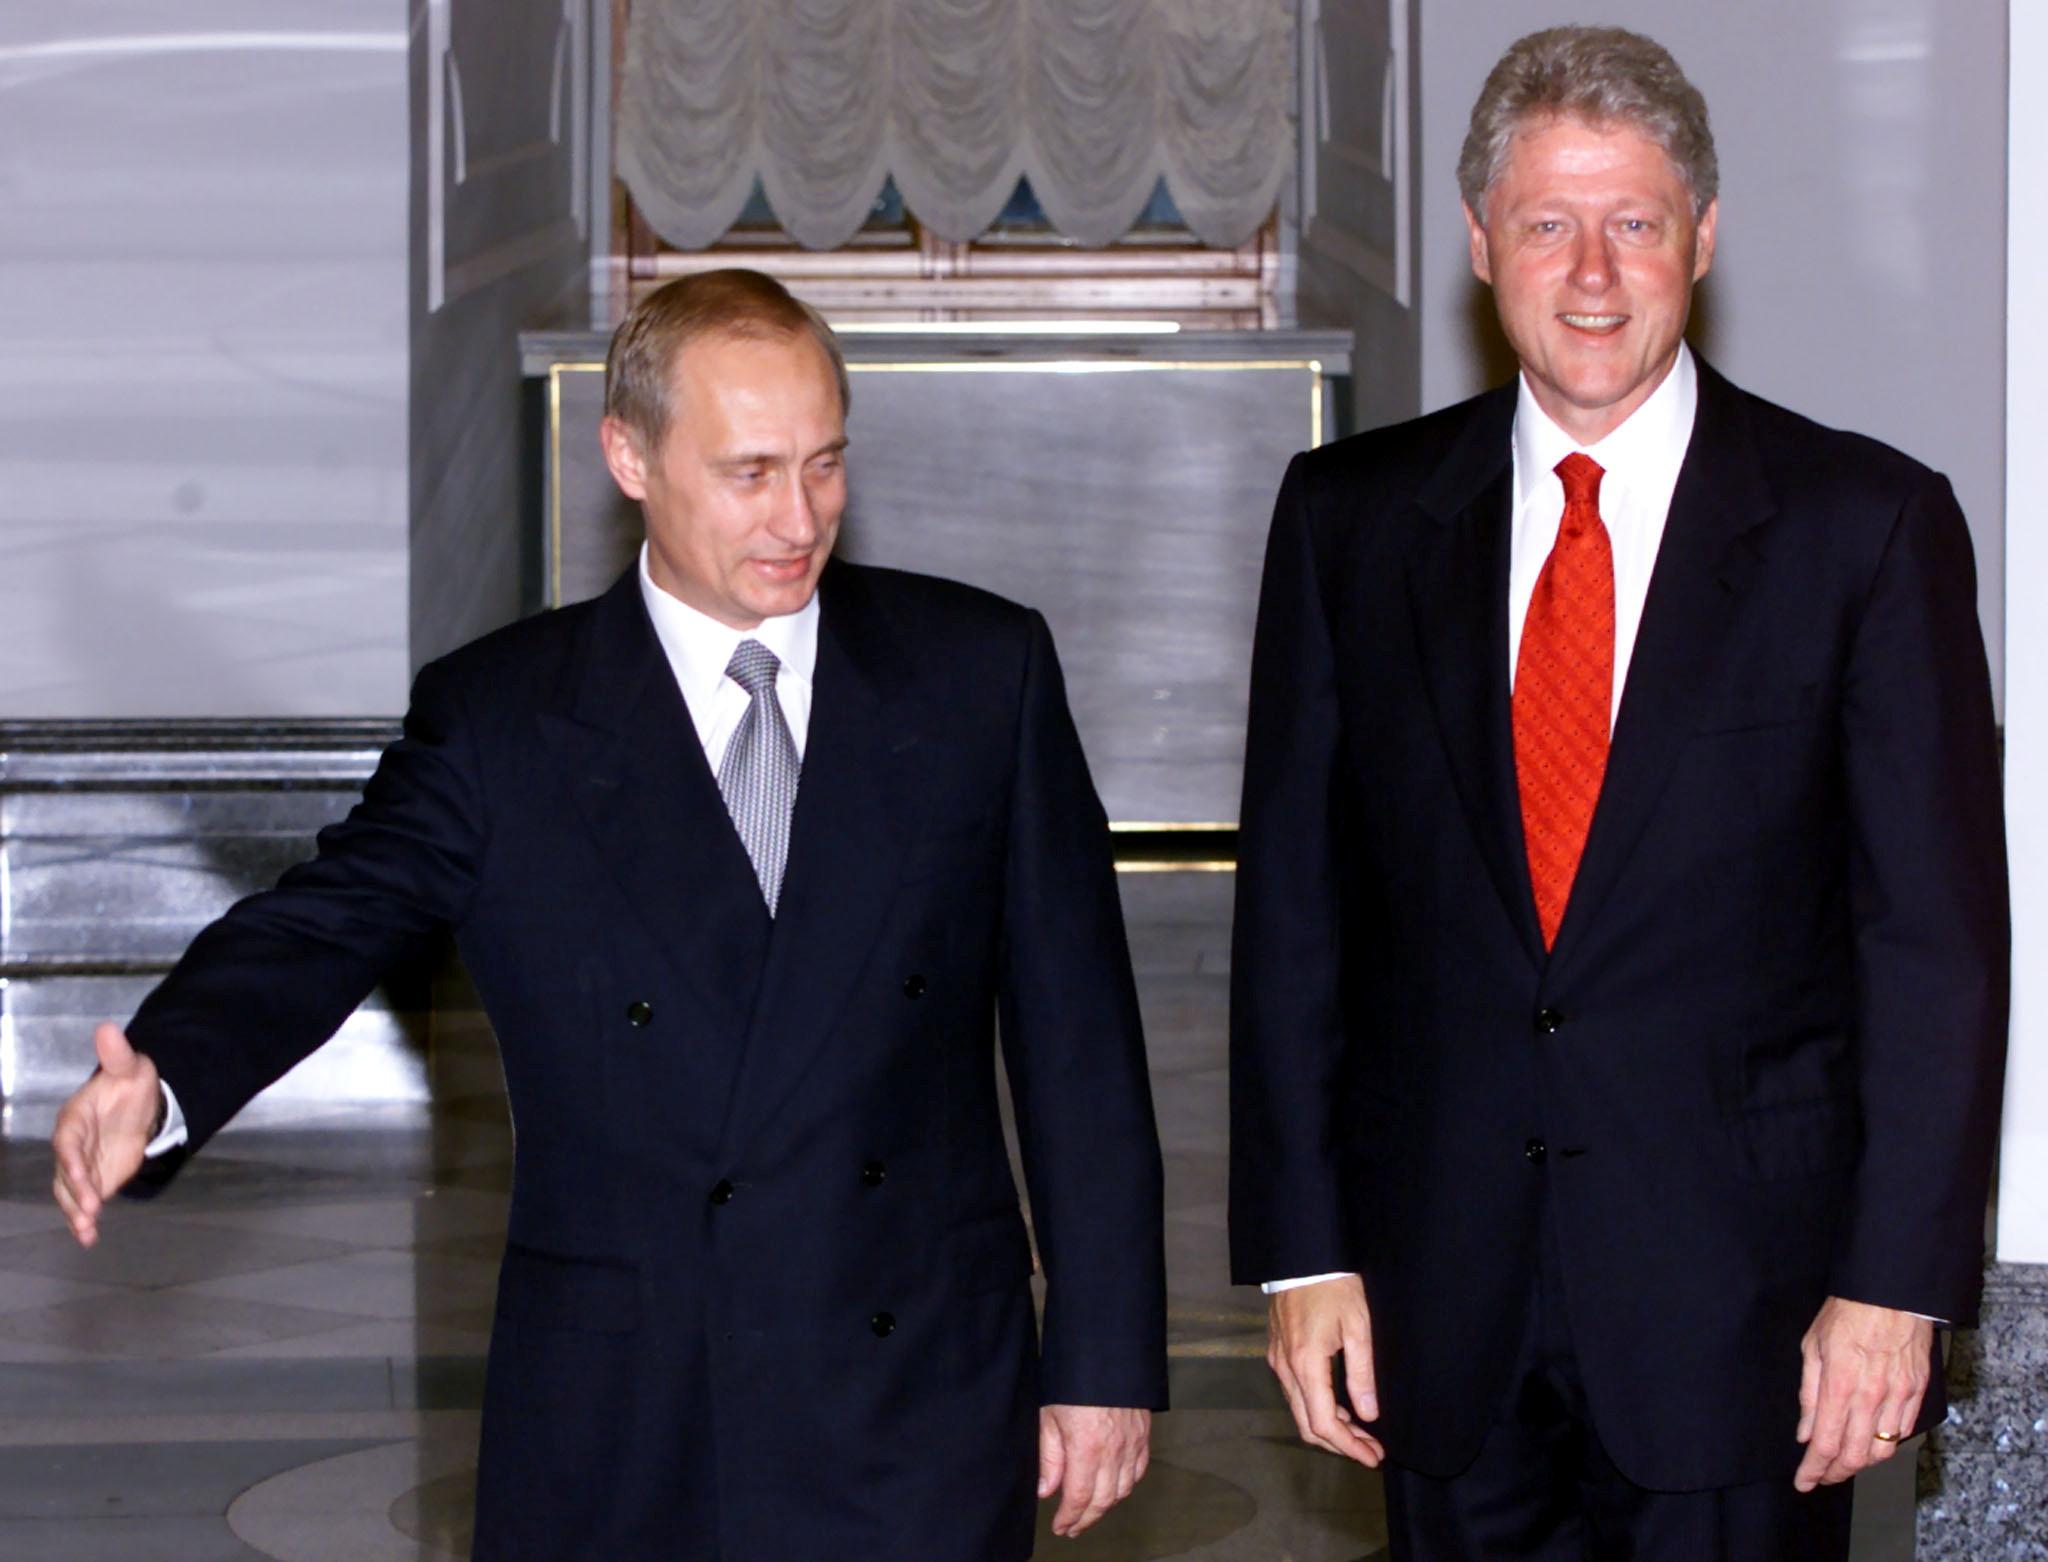 Russian President Vladimir Putin (L) gestures to invite U.S. President Bill Clinton as they meet in the Kremlin June 3, 2000 WAW/JDP/File Photo